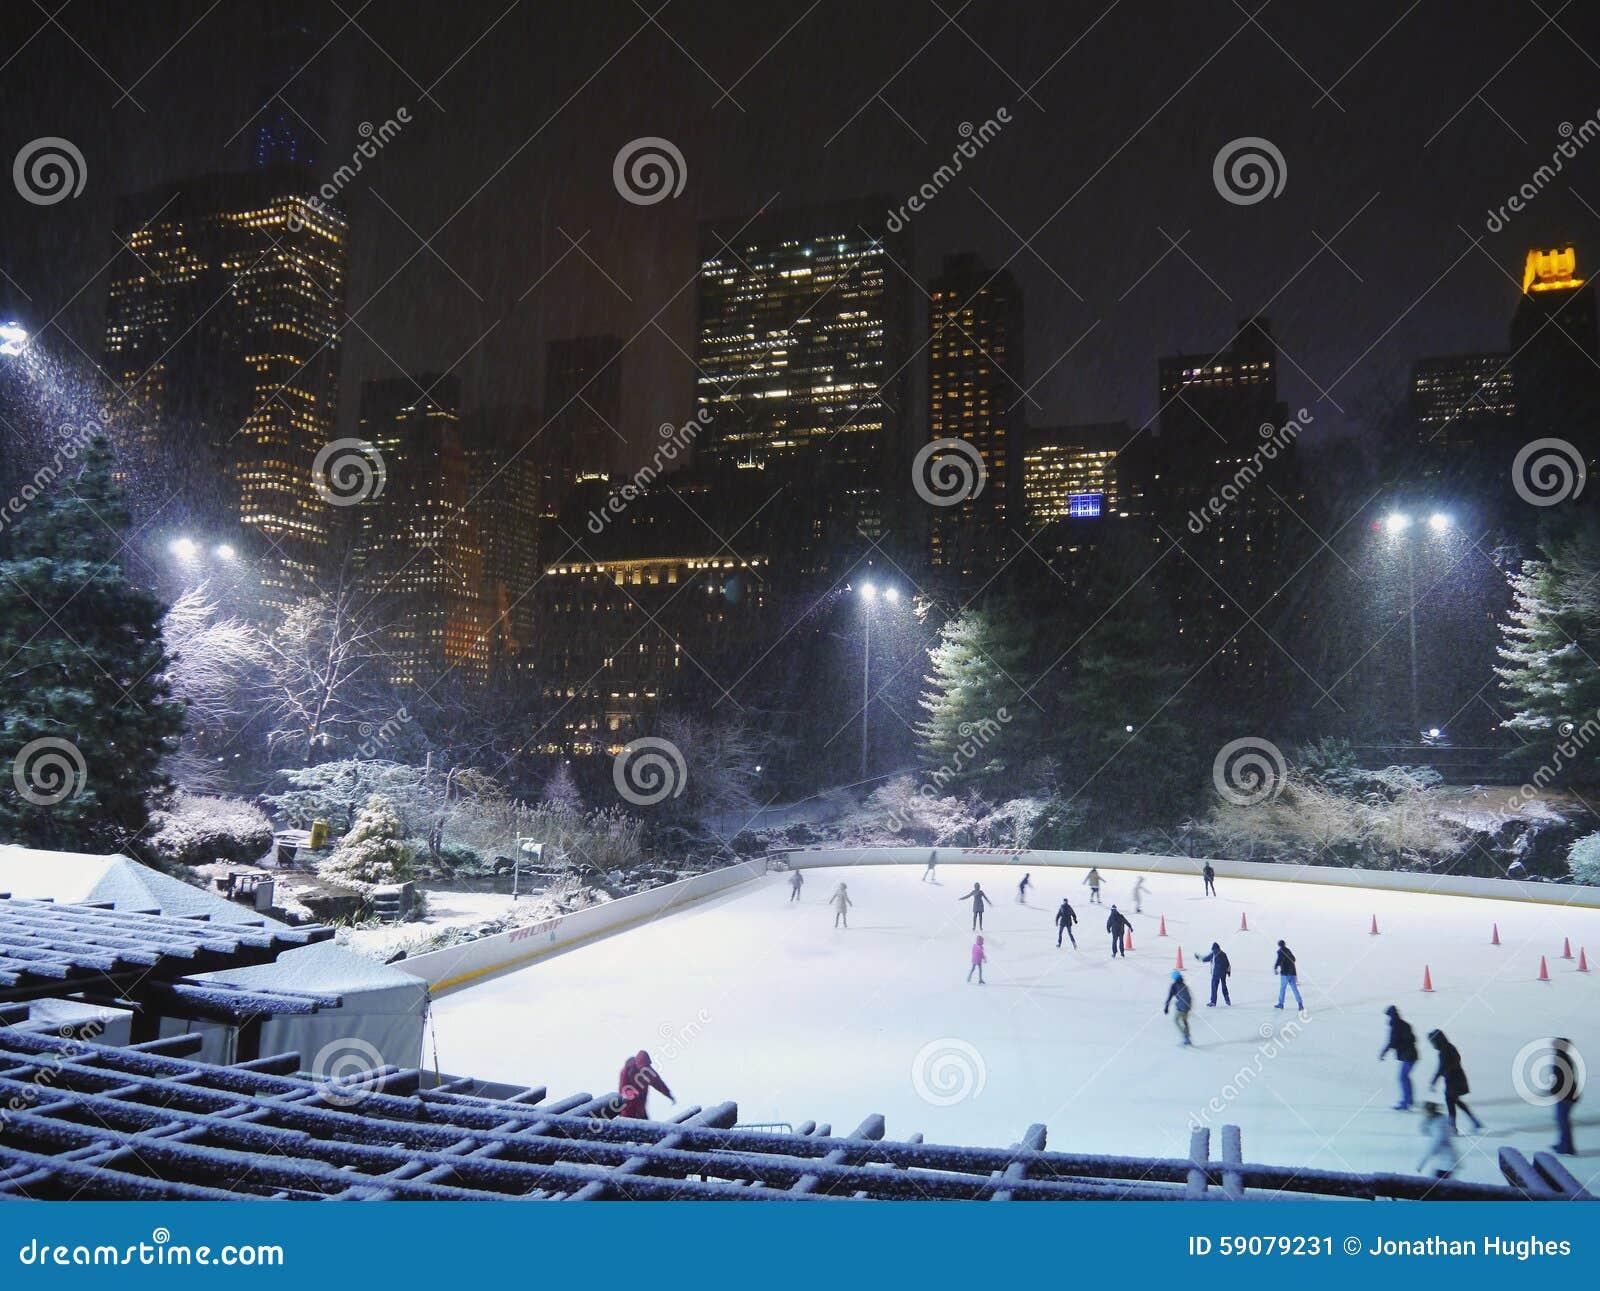 Ice skaters enjoy a wintery central park under snow, NYC